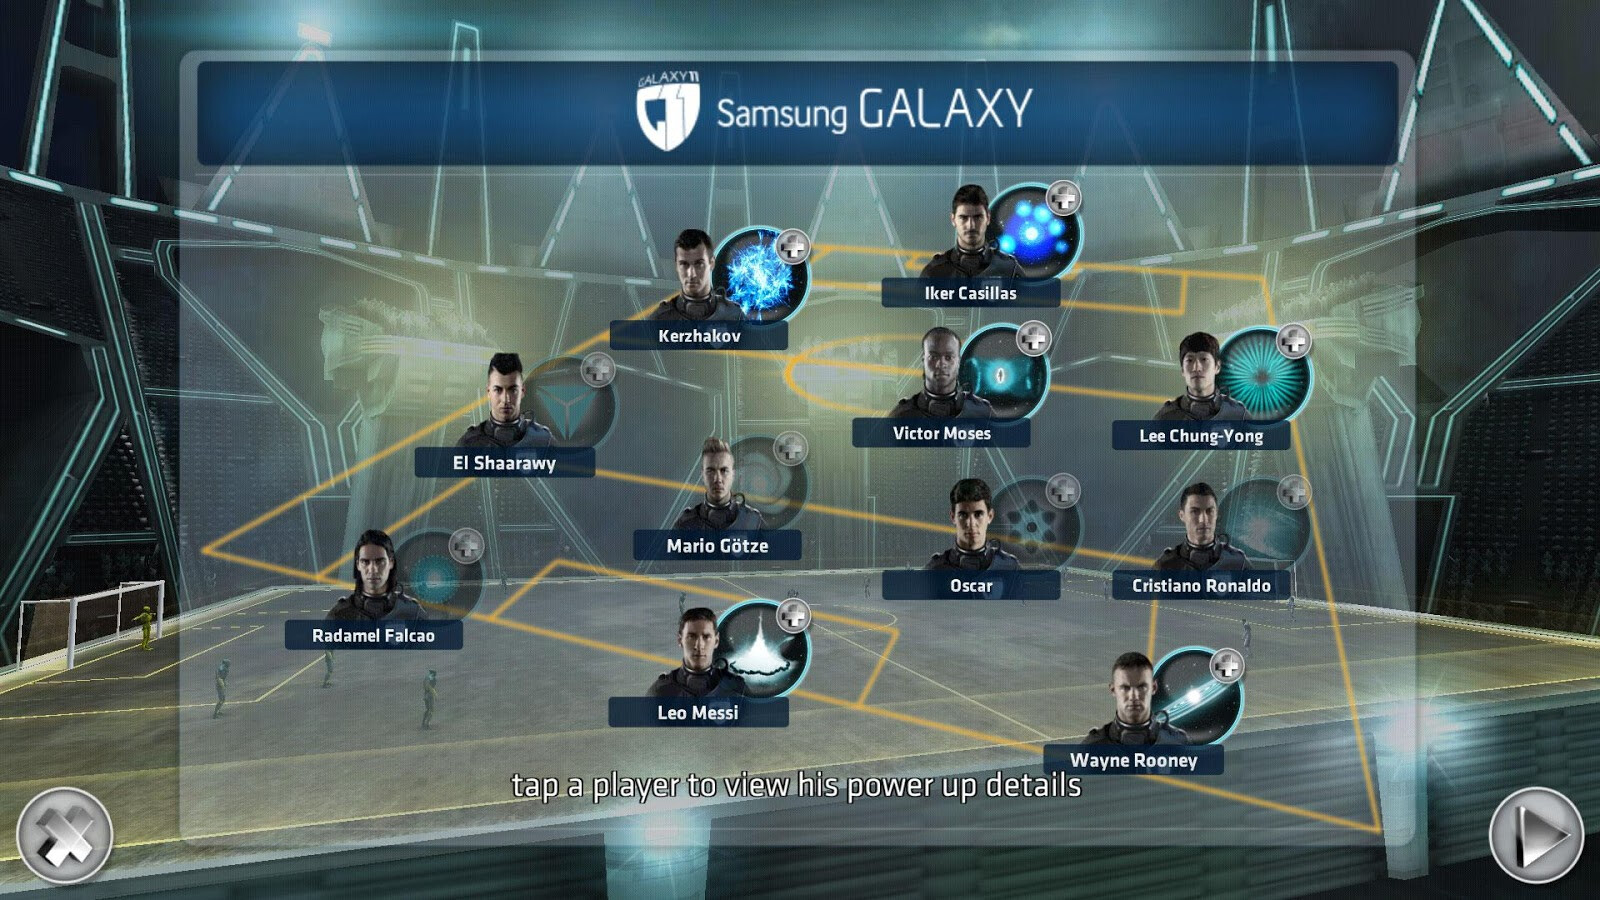 Galaxy 11: The Samsung Galaxy S5 and soccer, okay ...